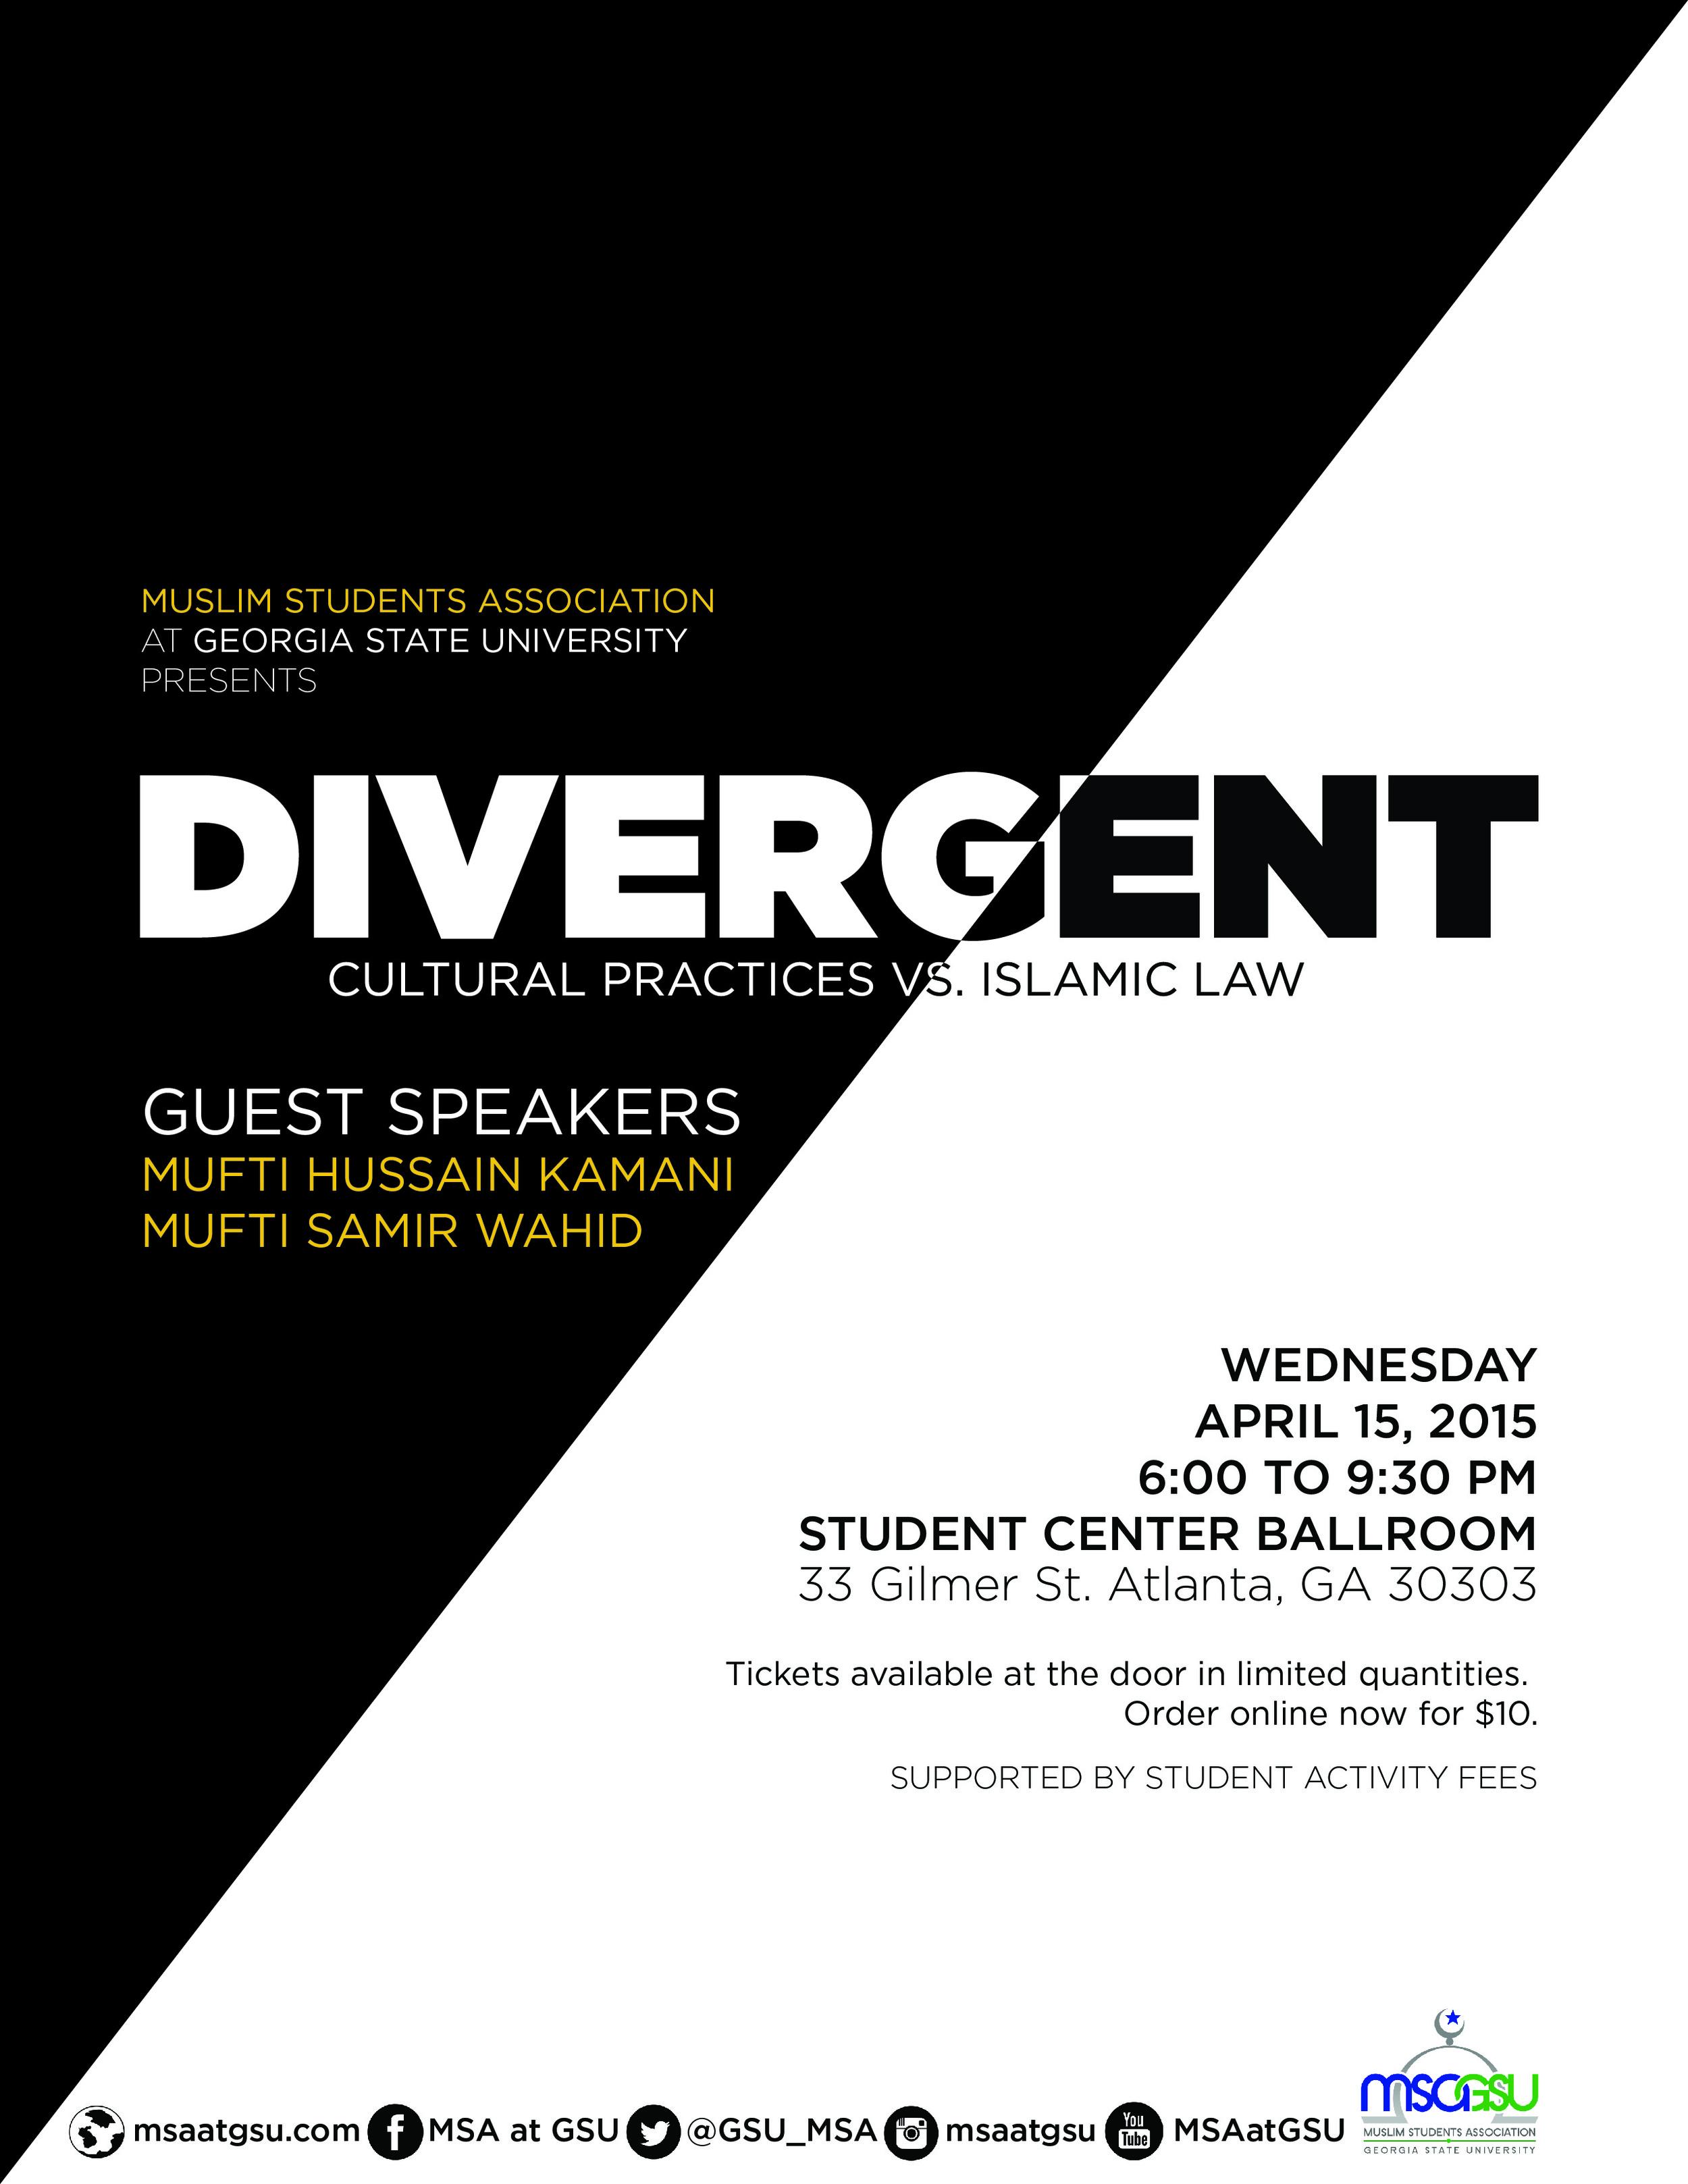 Divergent: Cultural Practices vs Islamic Law